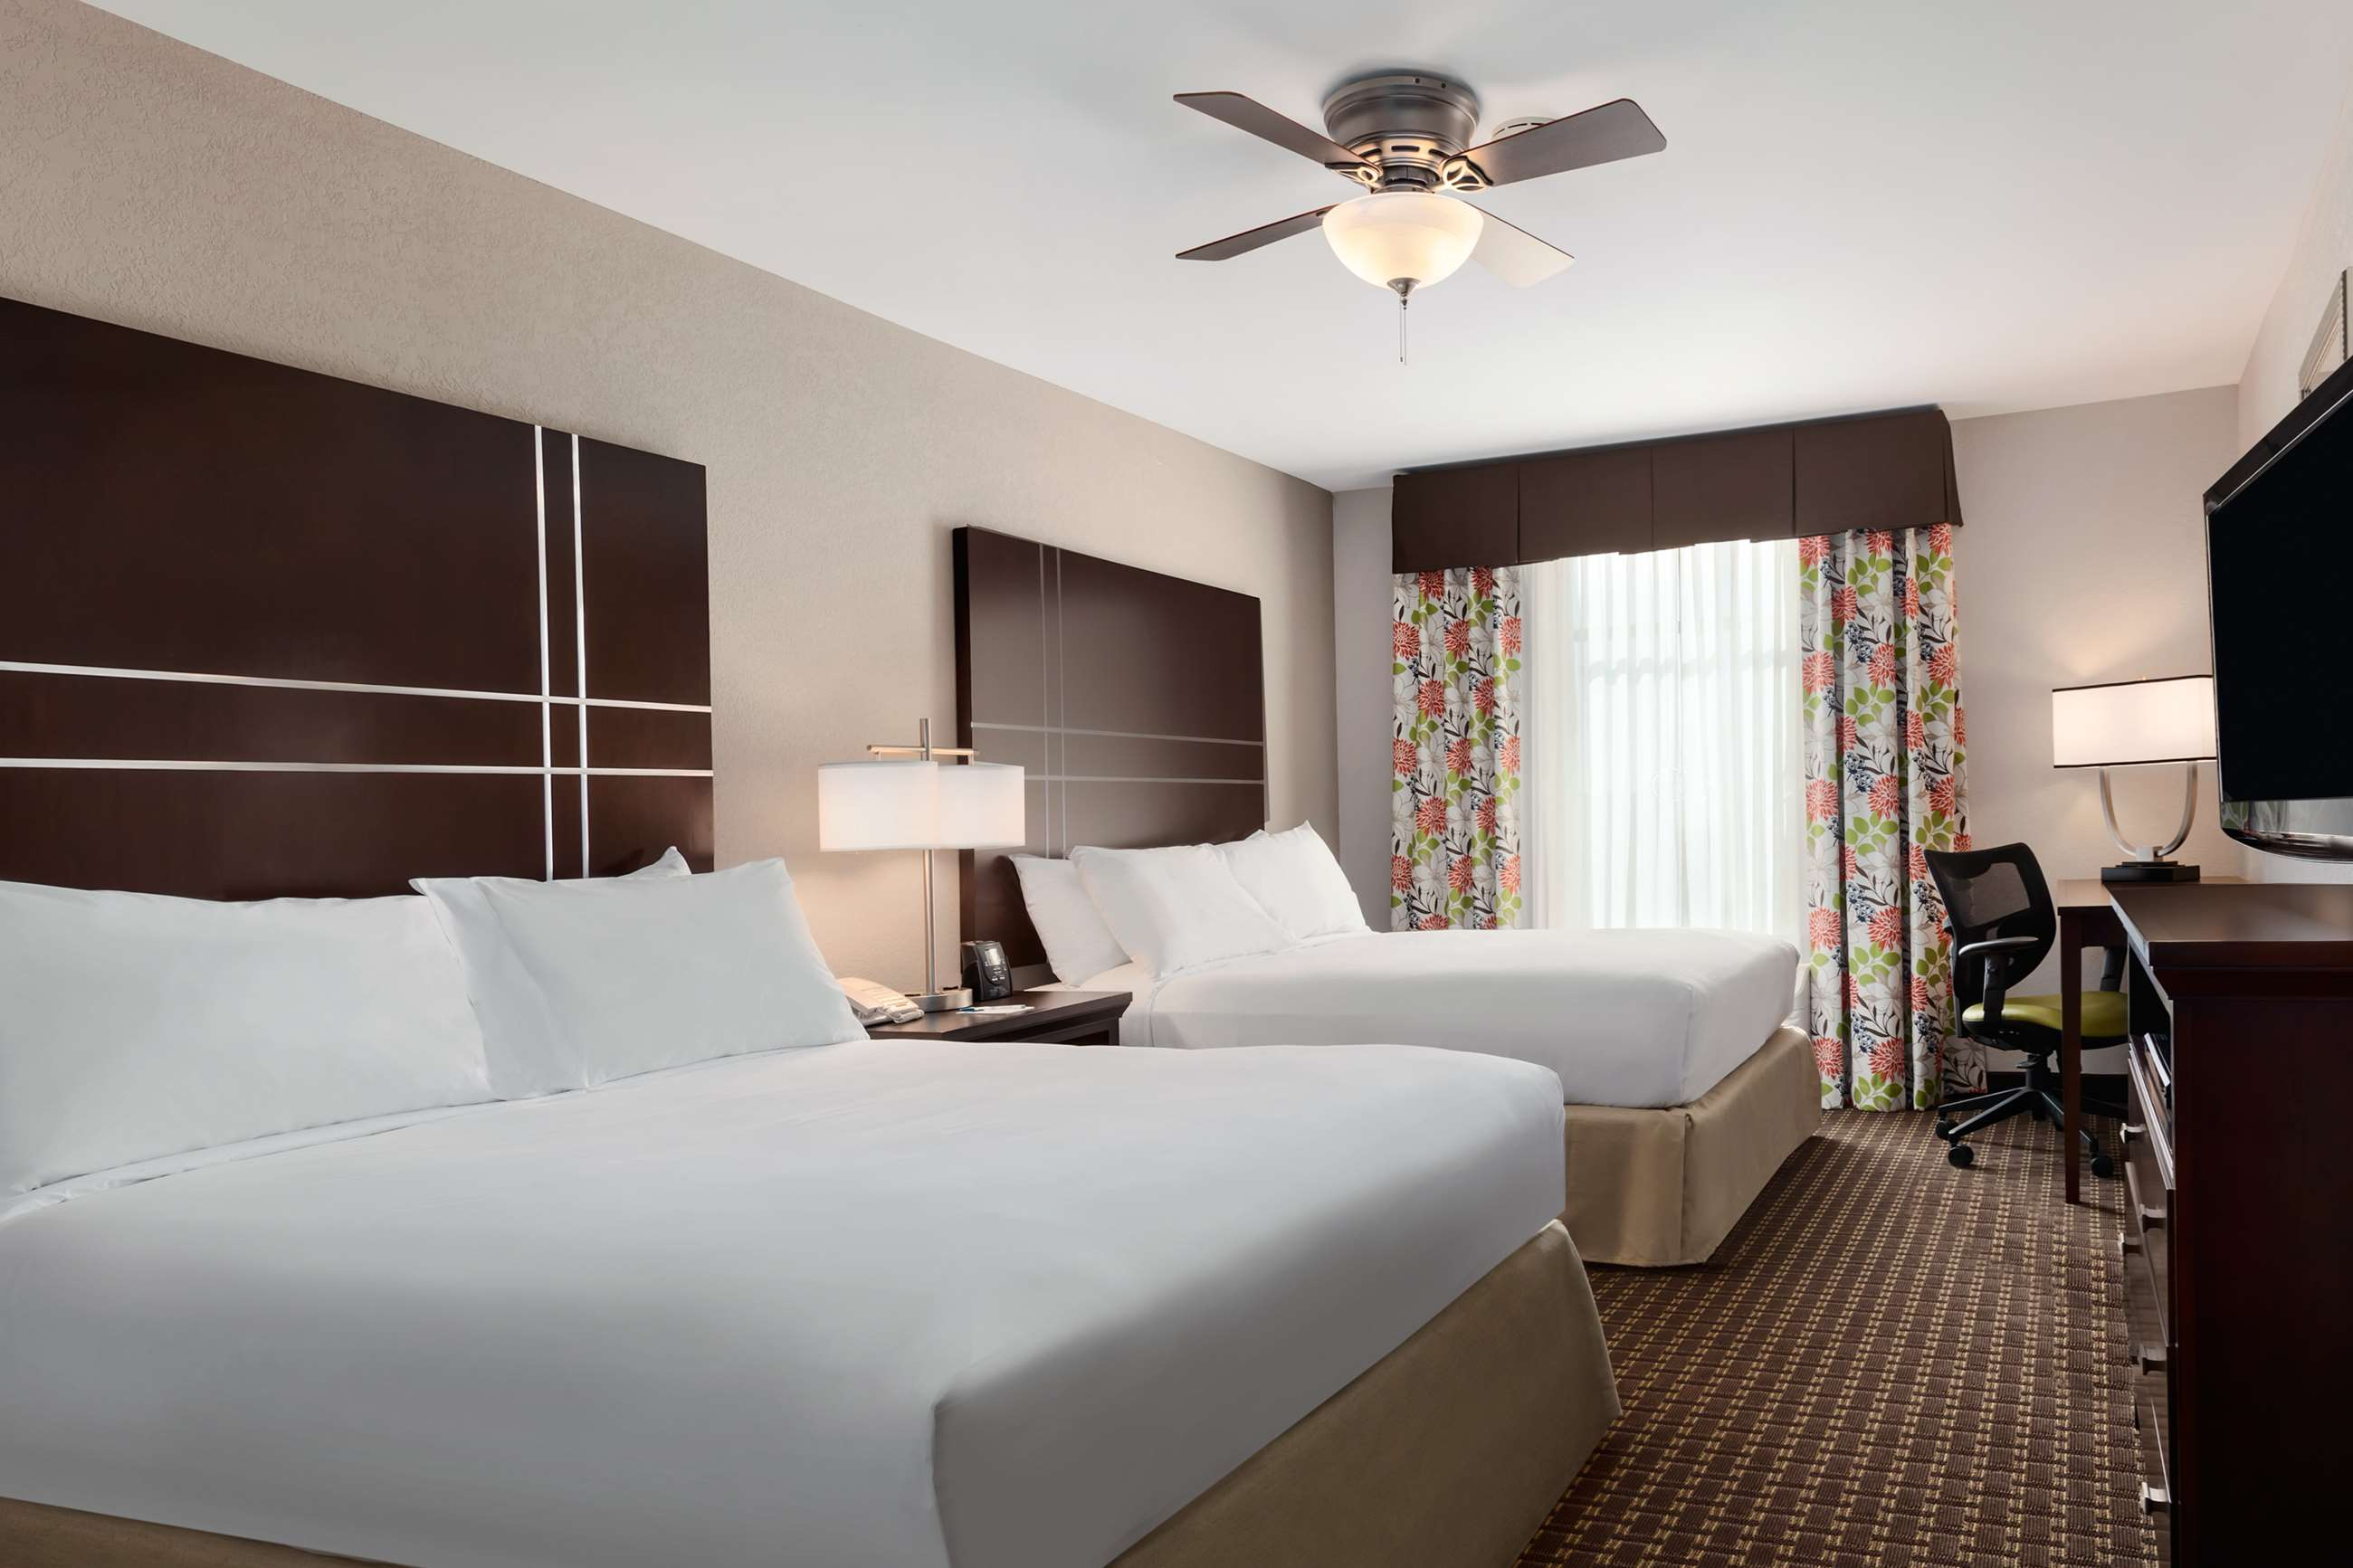 Homewood Suites by Hilton Joplin, MO image 10